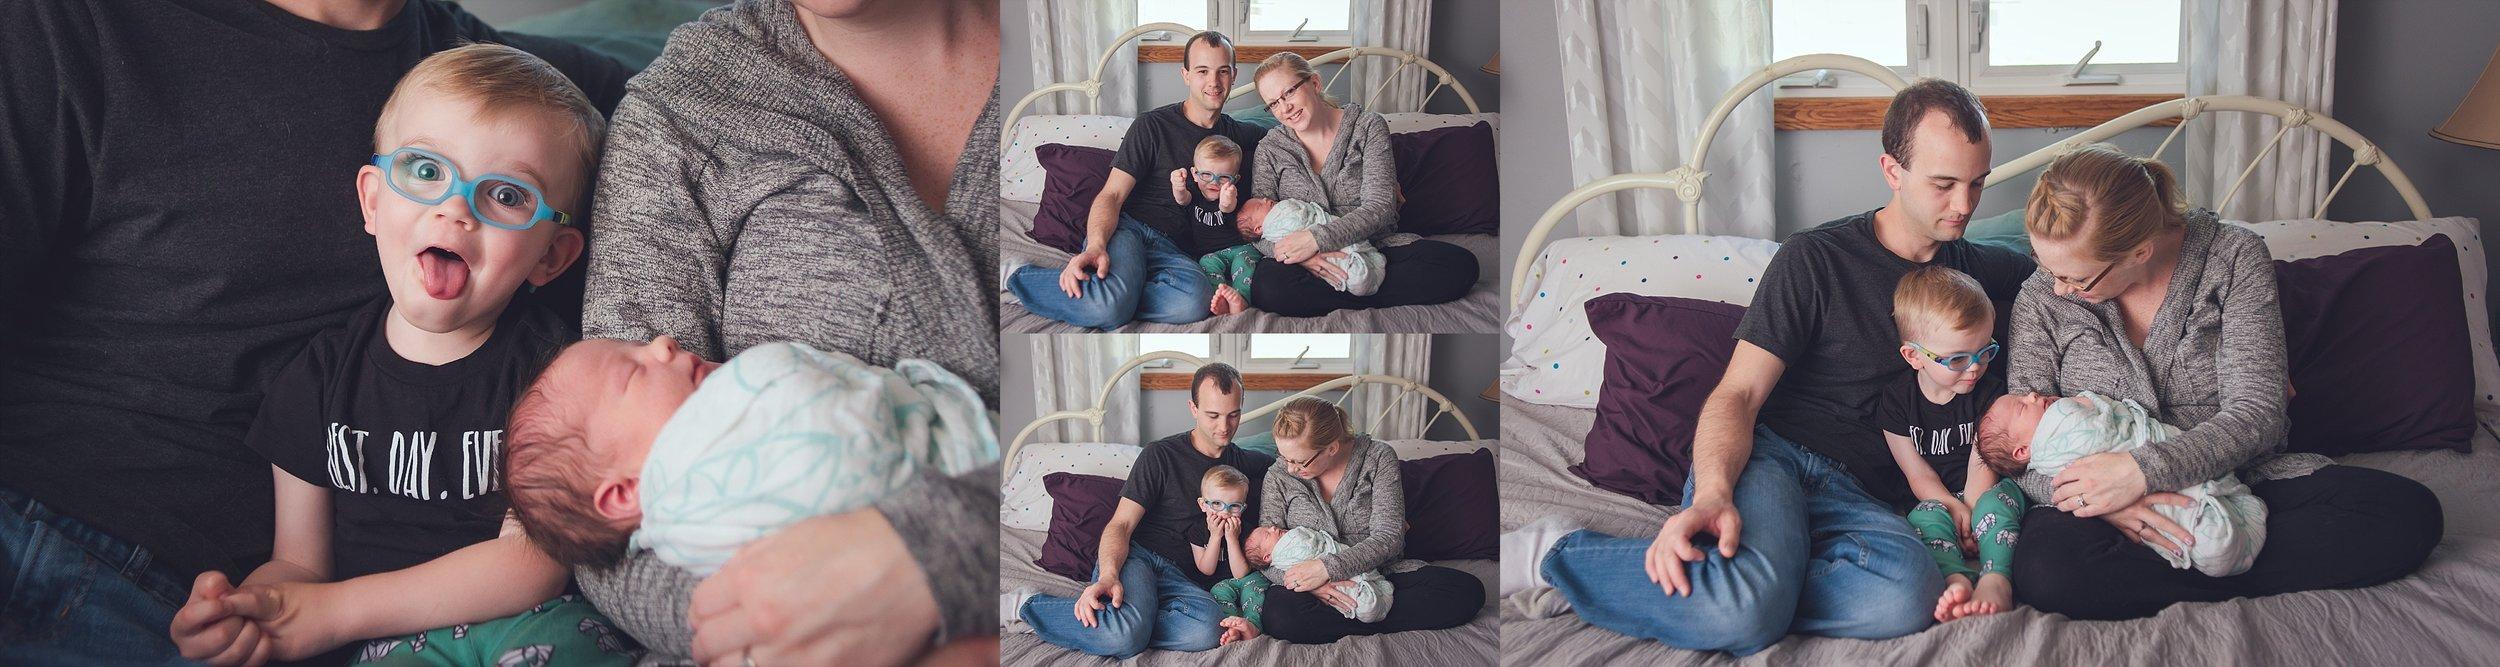 BrittneyHogue-NewbornPhotographer-FamilyPhotographer-PeoriaIL-PekinIL-MortonIL (5).jpg